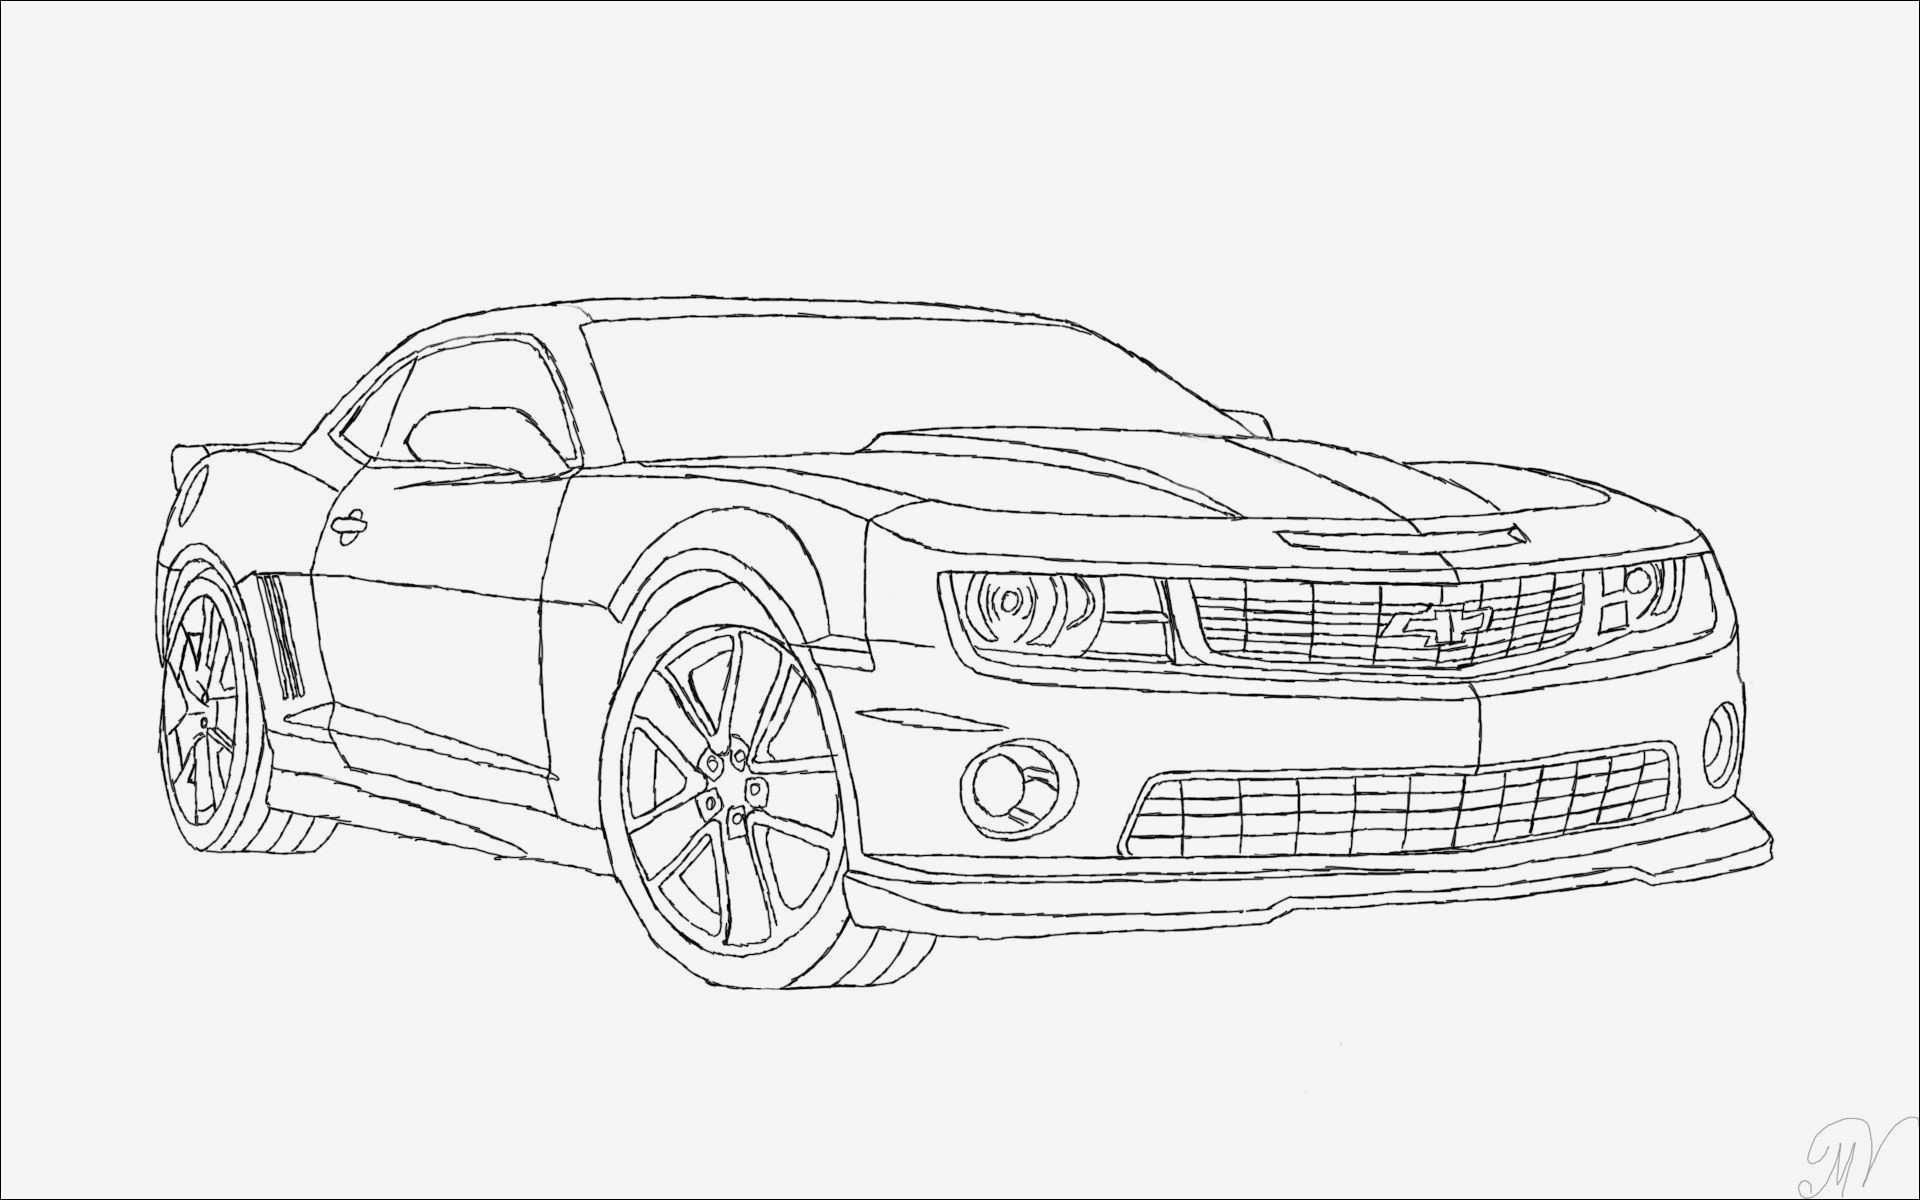 Malvorlagen Auto Motorrad Genial Bmw X6 Ausmalbild Cartoon Bild E9dx Fotos